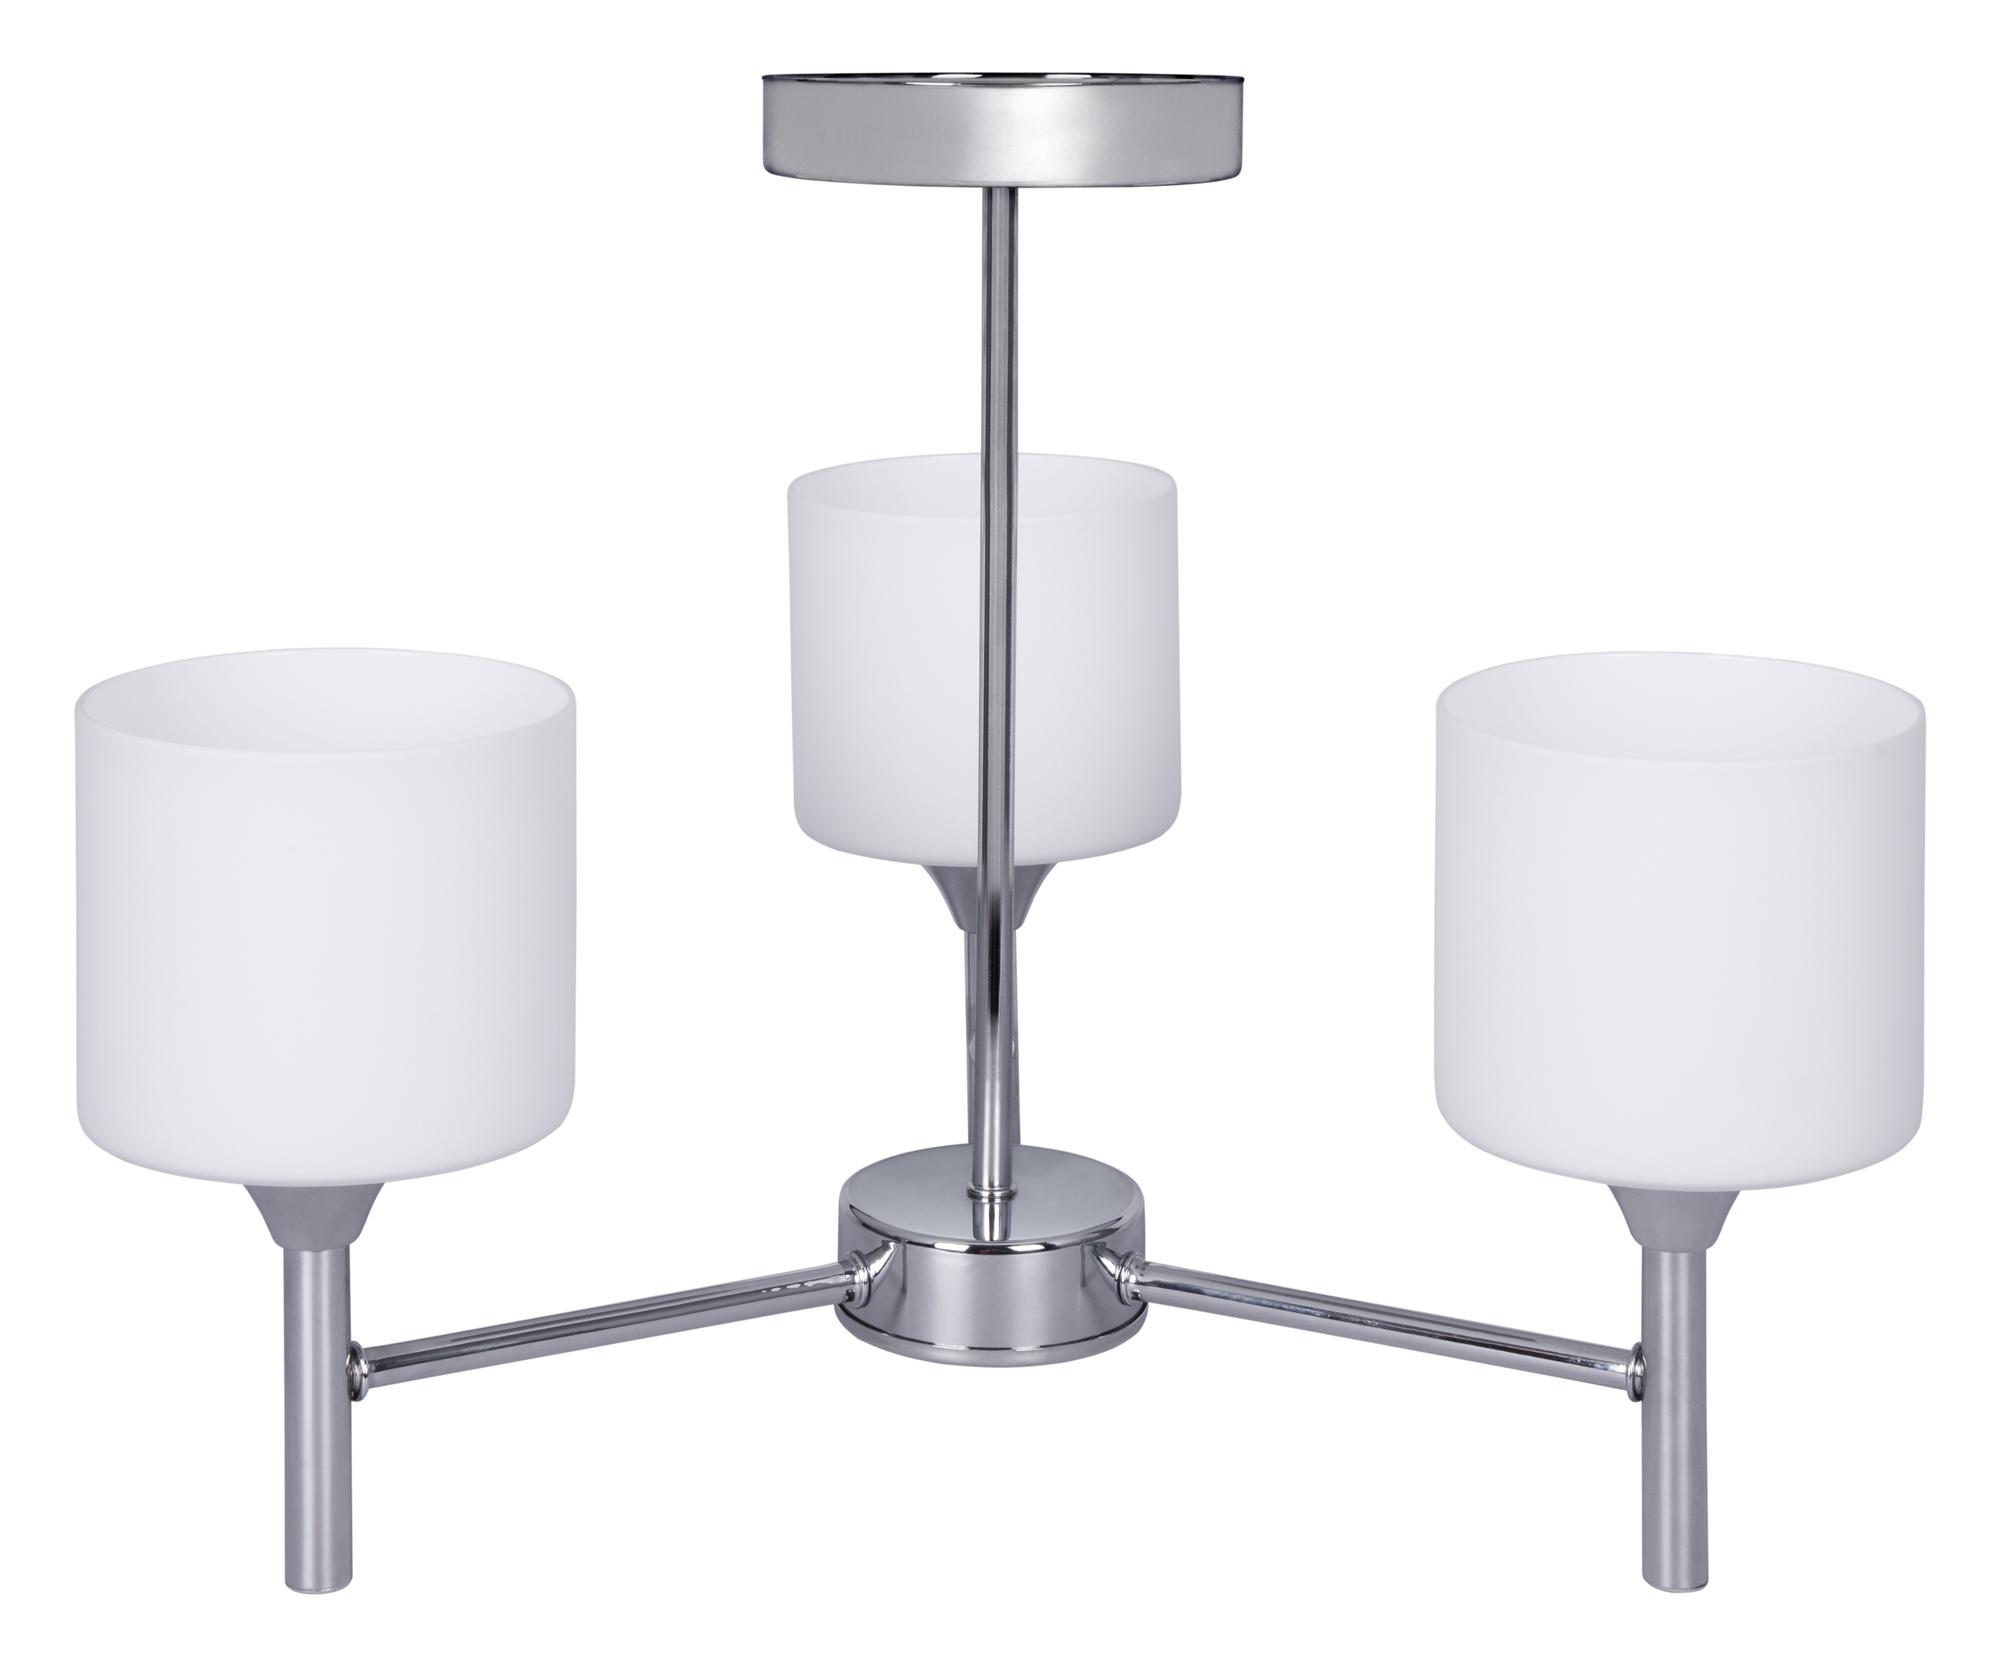 Lampa wisząca Activejet AJE-MIRA 3P E27 3x40W